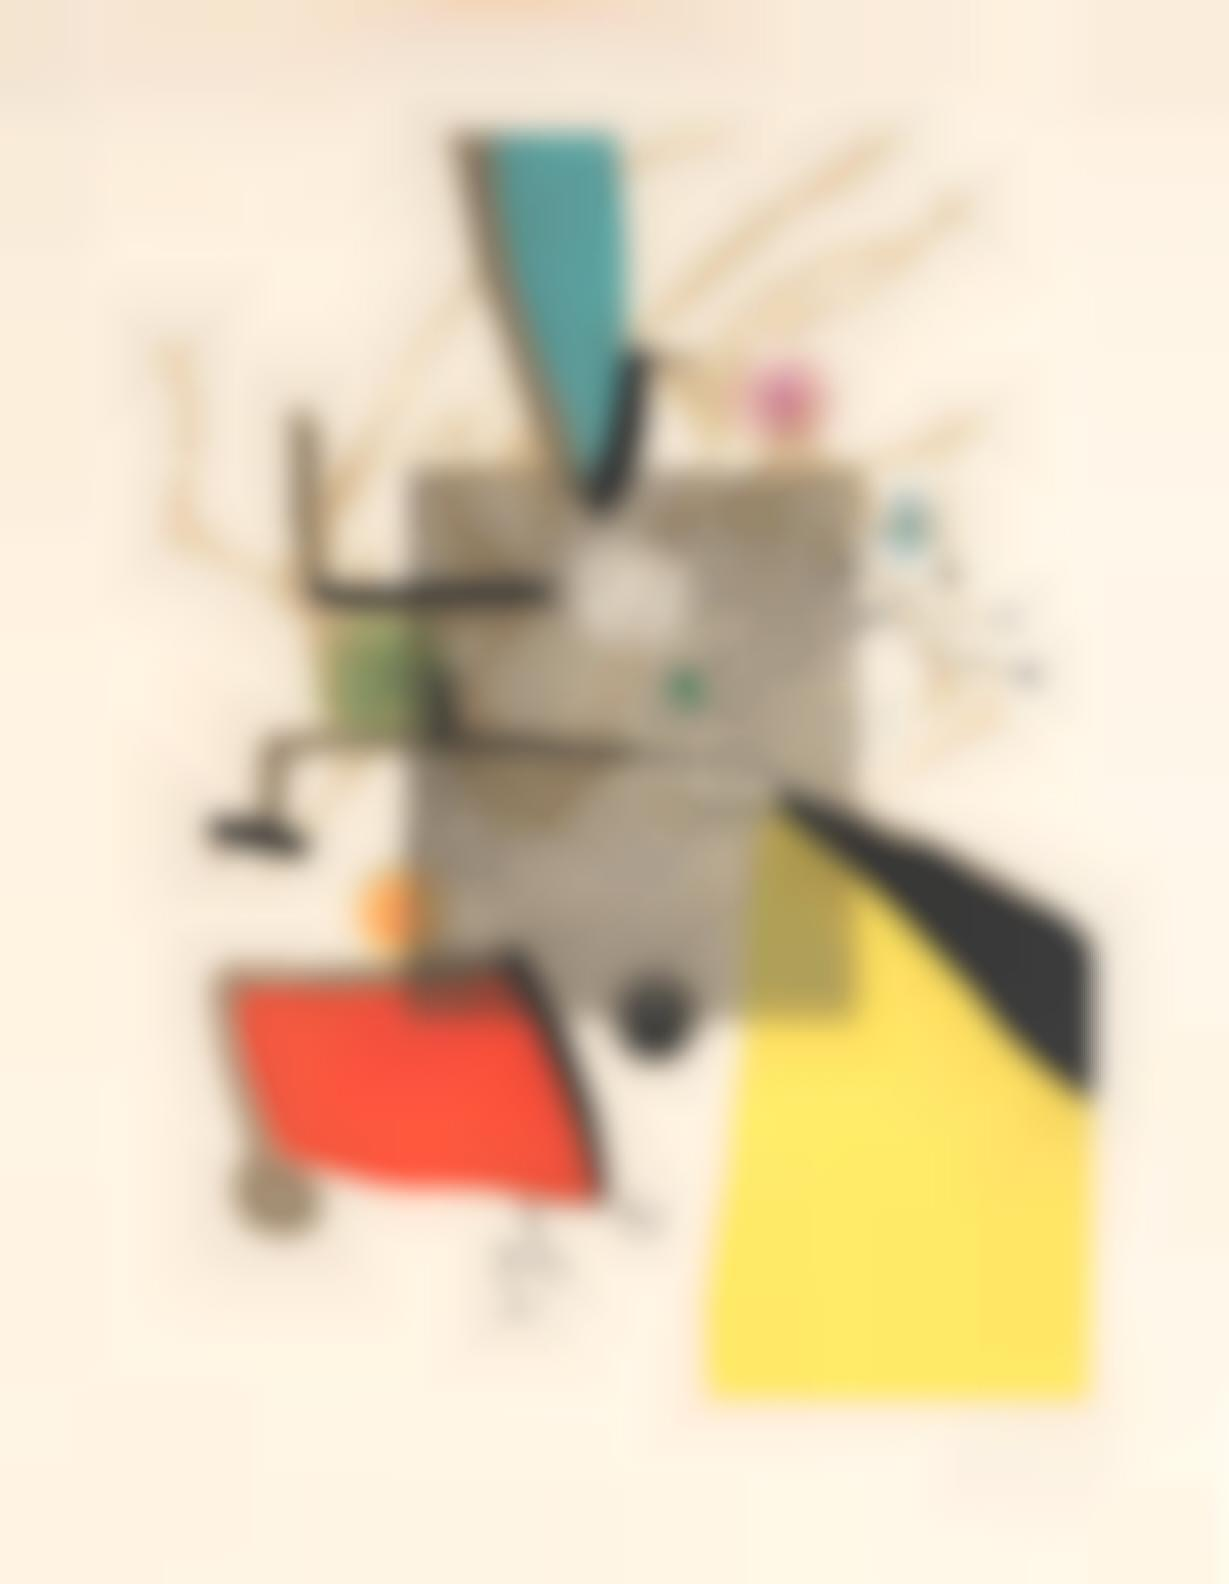 Joan Miro-Llibre Dels Sis Sentis (Dupin 1165-1170; Cramer Books 252)-1981